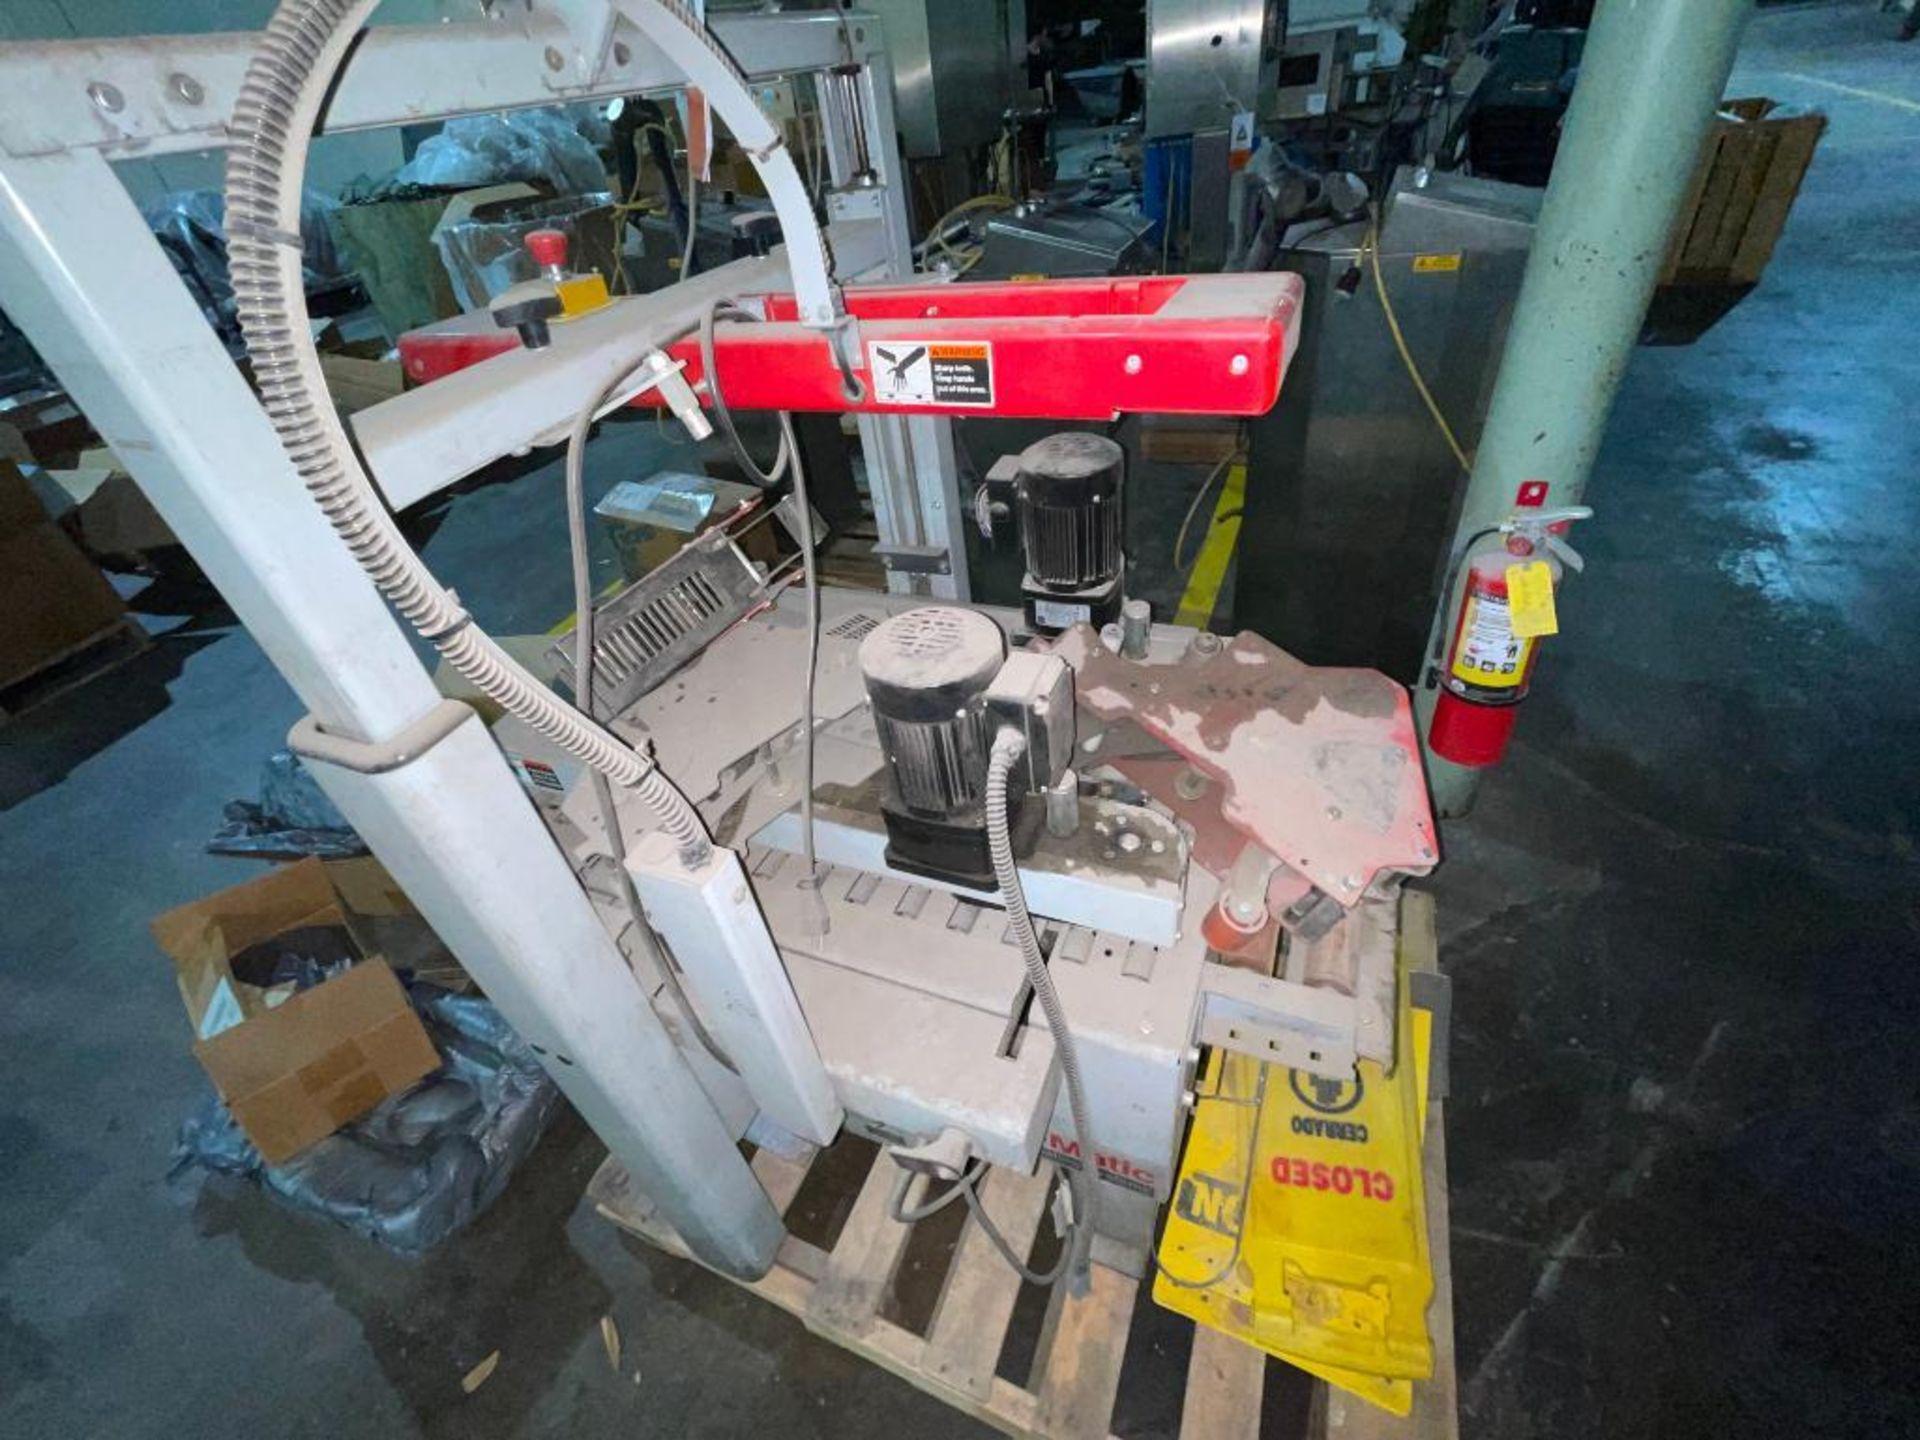 2009 3M-Matic case taper - Image 2 of 13